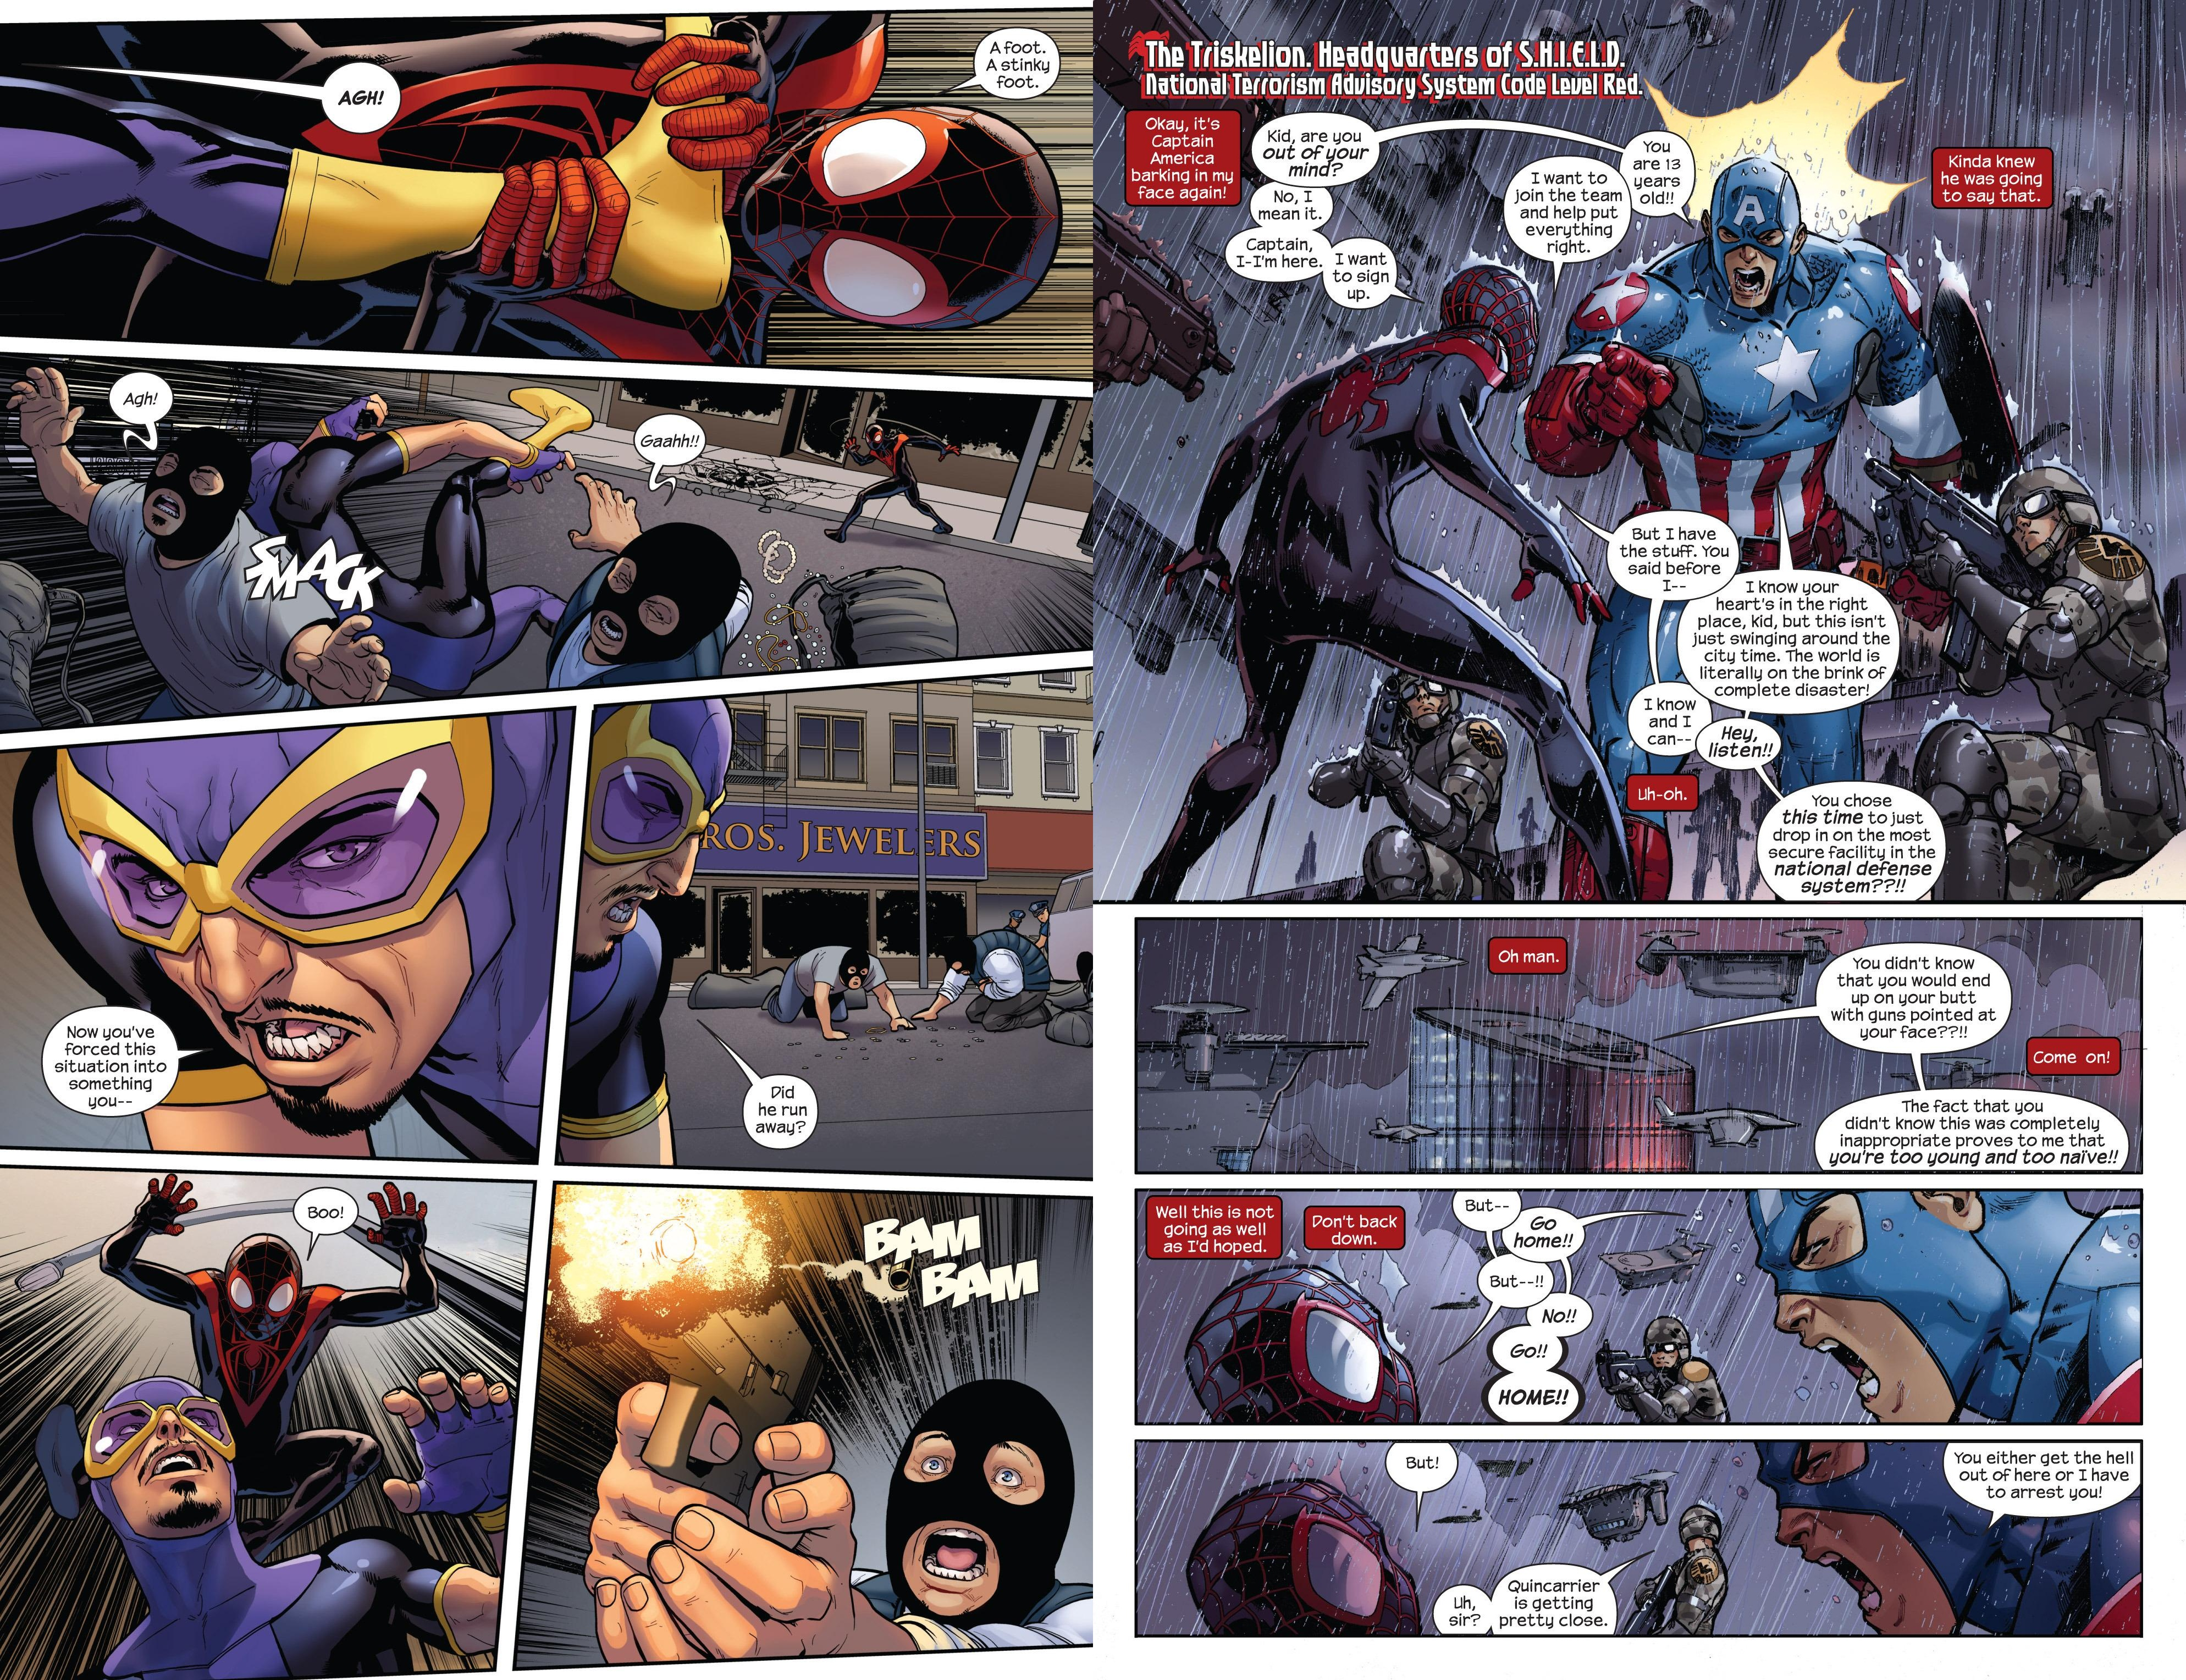 Ultimate Comics Spider-Man V3 review